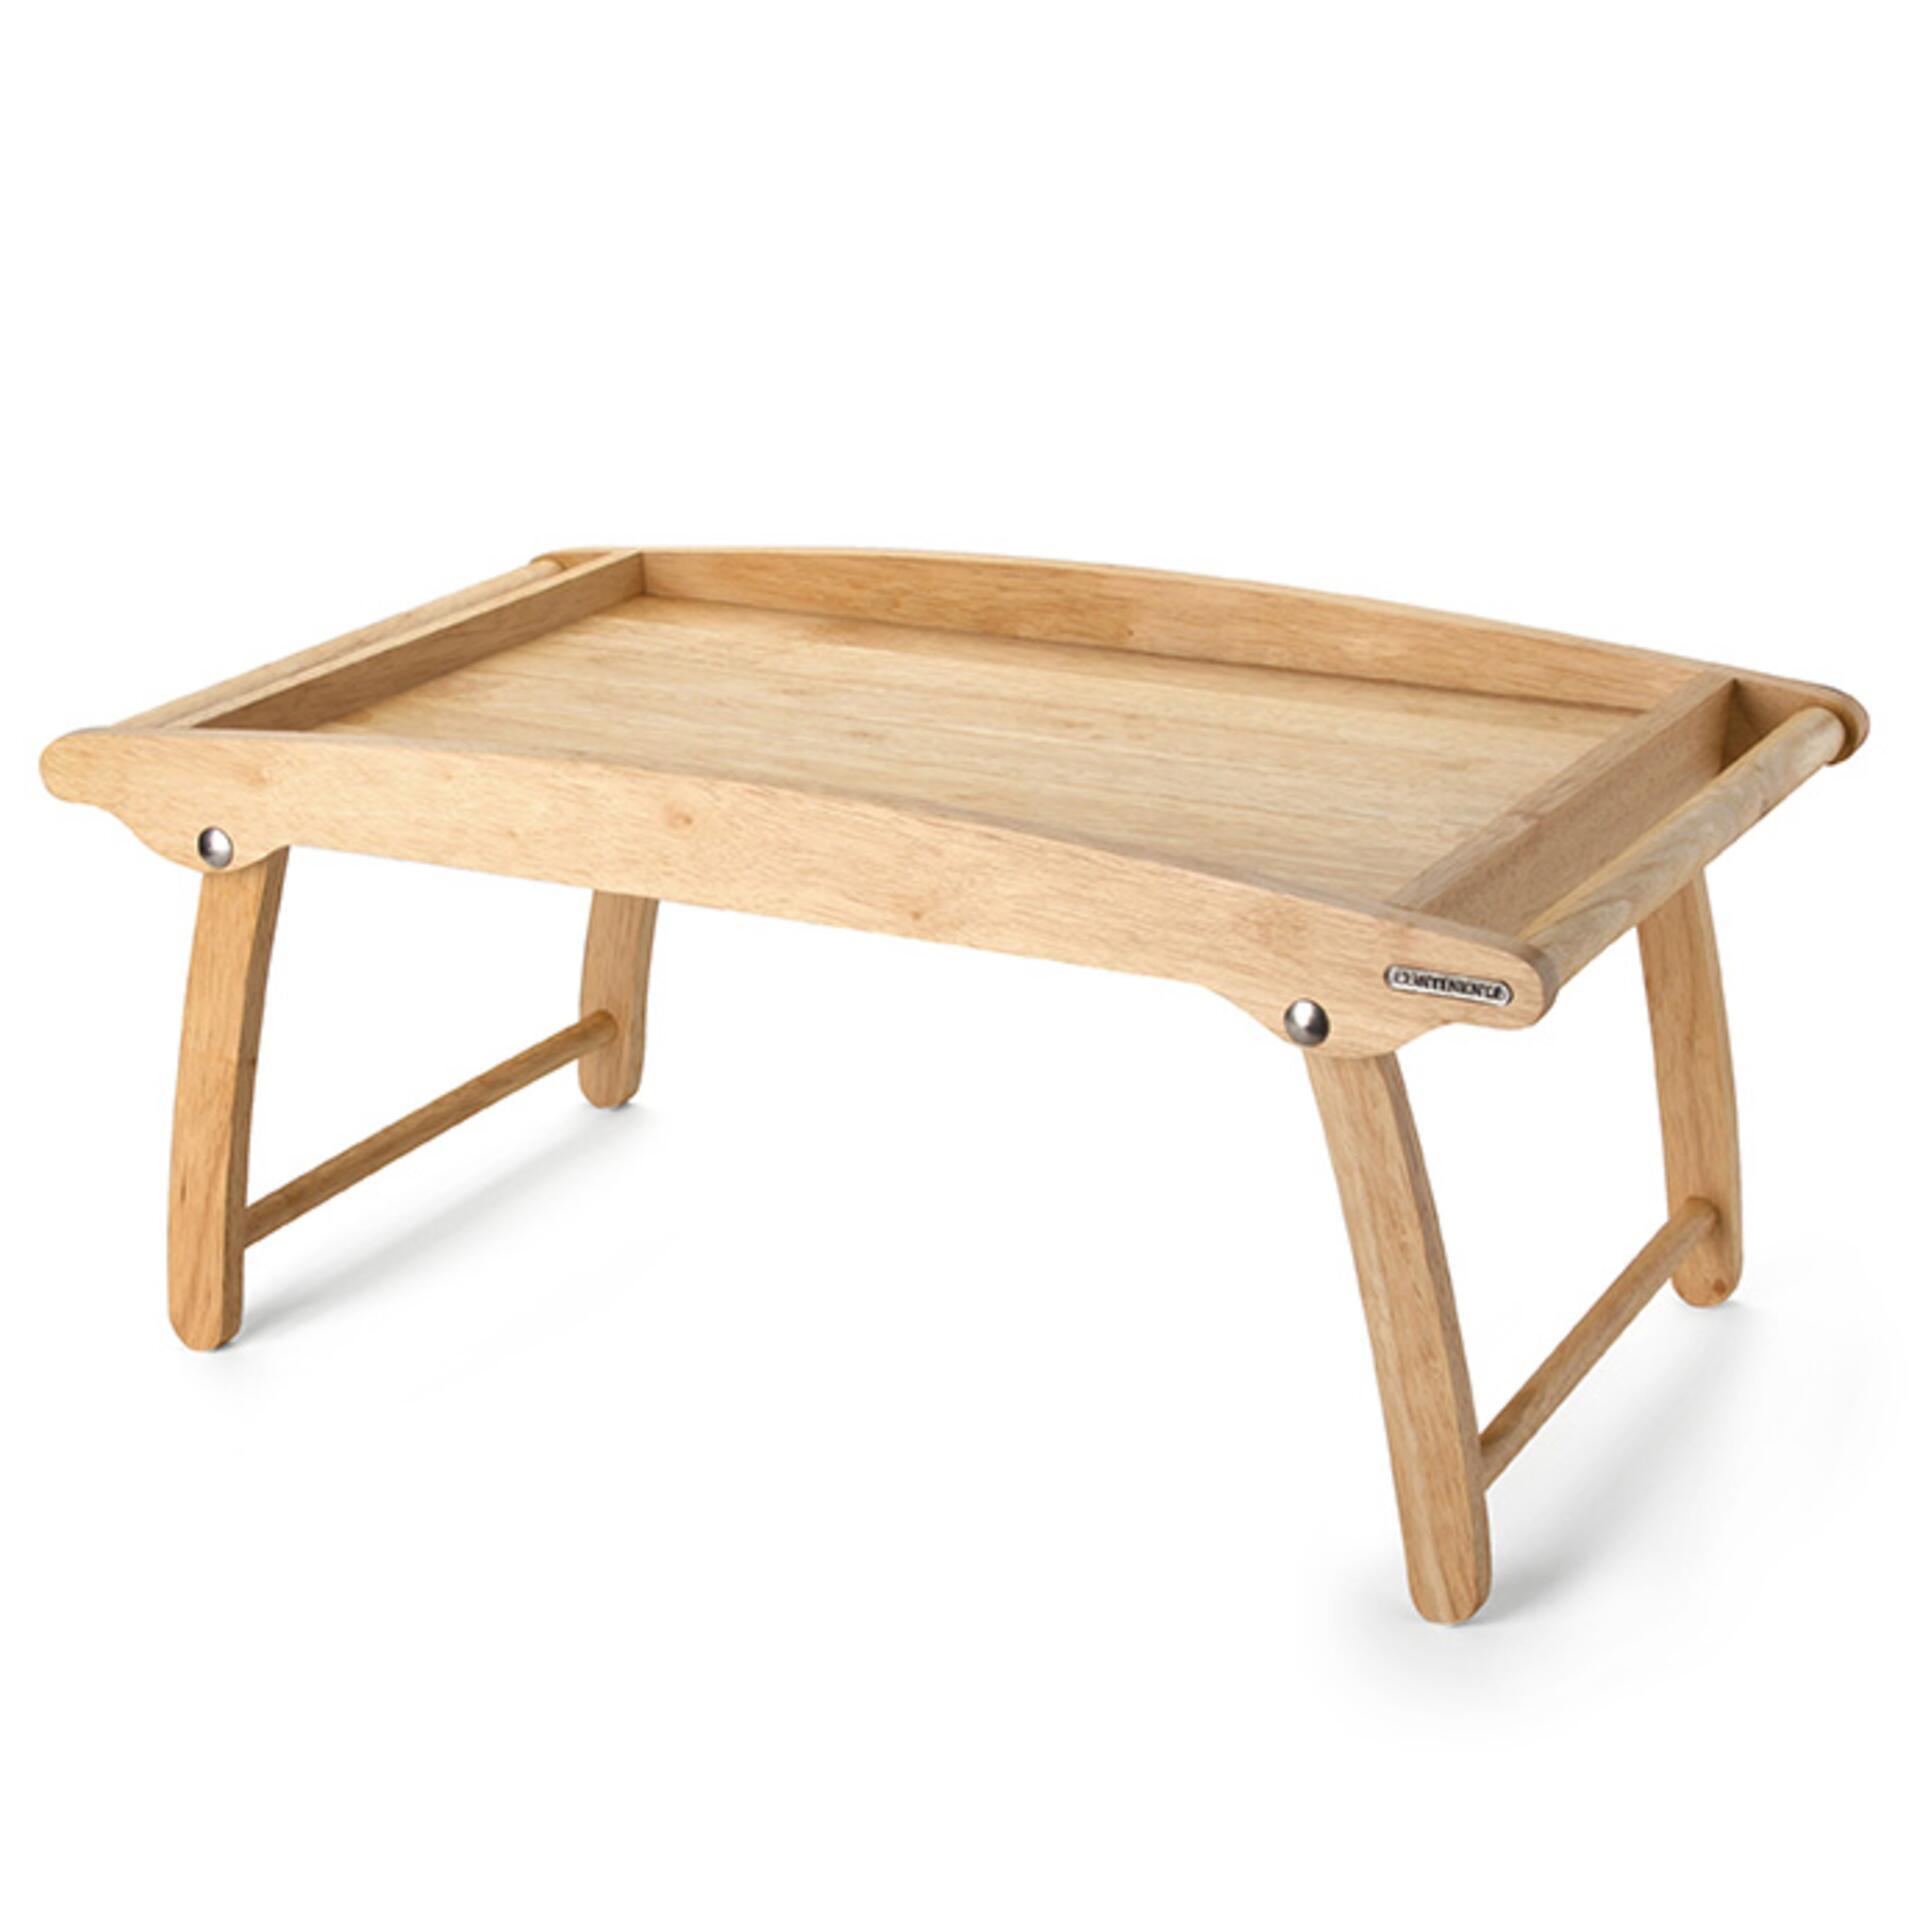 Continenta Betttablett Holz 61 x 35 x 7 cm